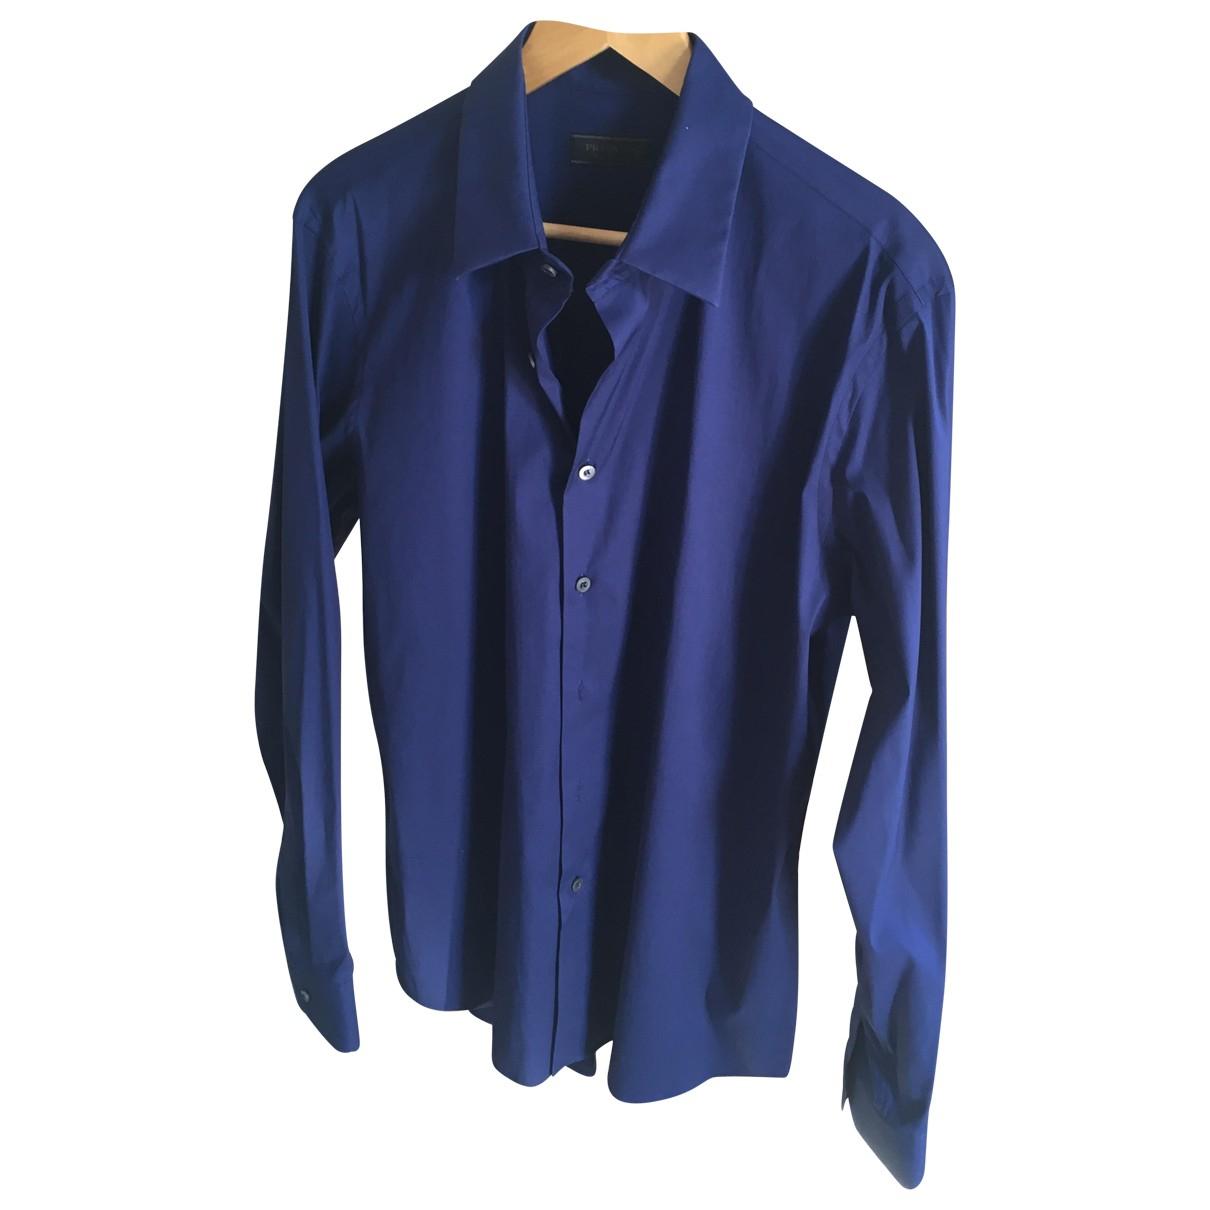 Prada \N Blue Cotton Shirts for Men 43 EU (tour de cou / collar)